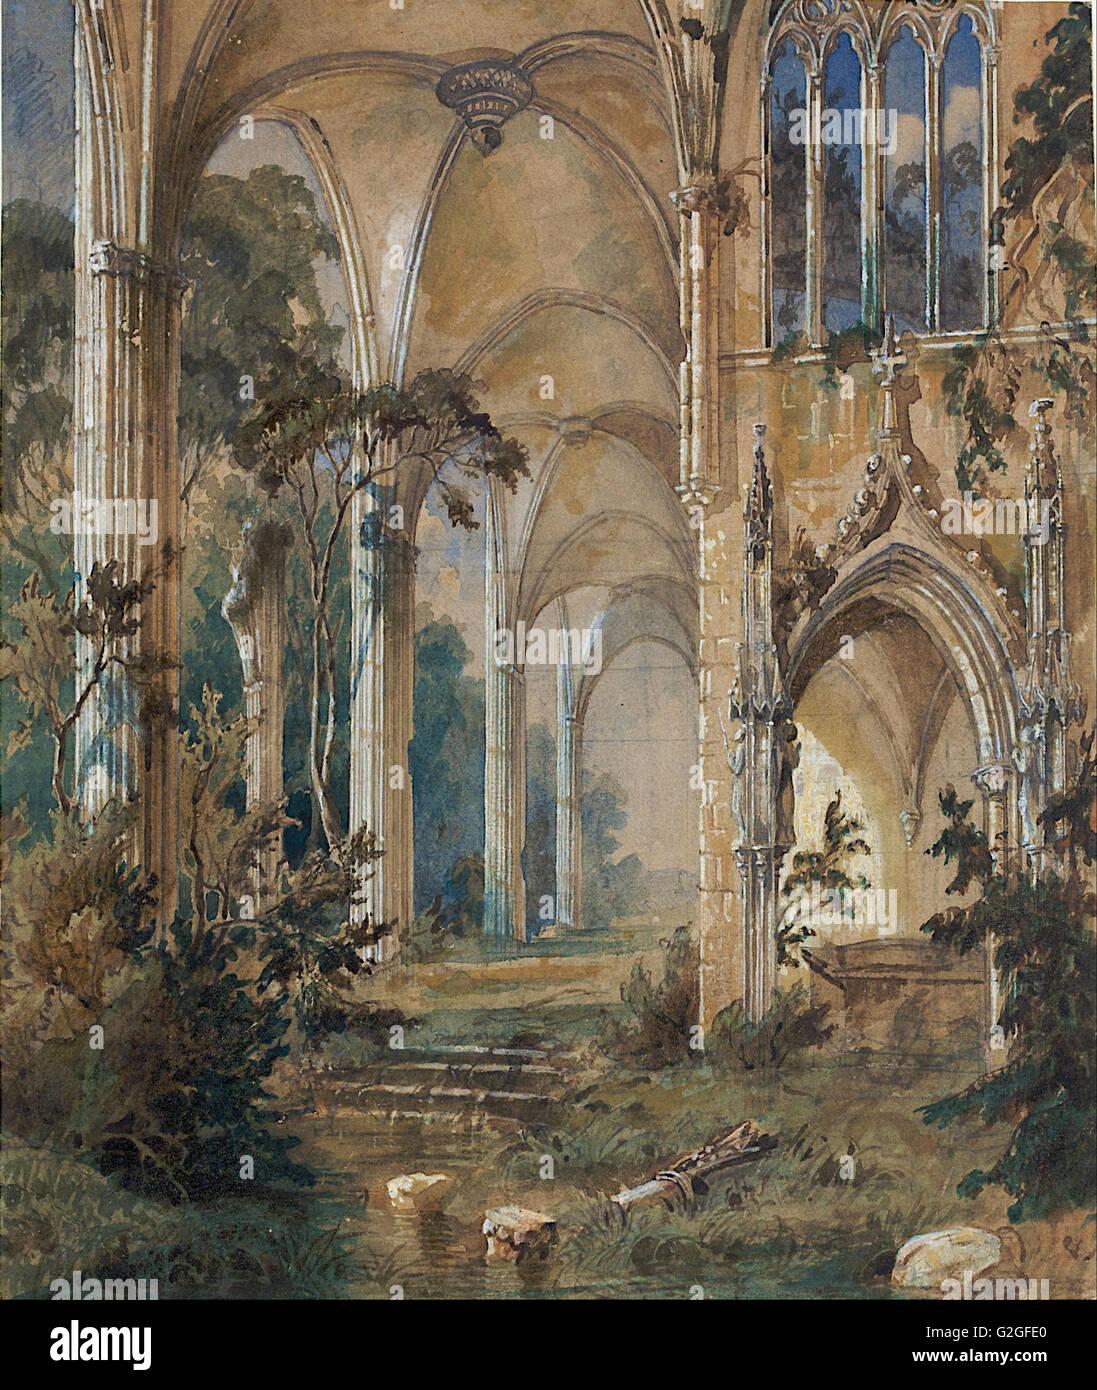 Carl Blechen - chiesa gotica rovina - Museo Kunstpalast, Düsseldorf Immagini Stock